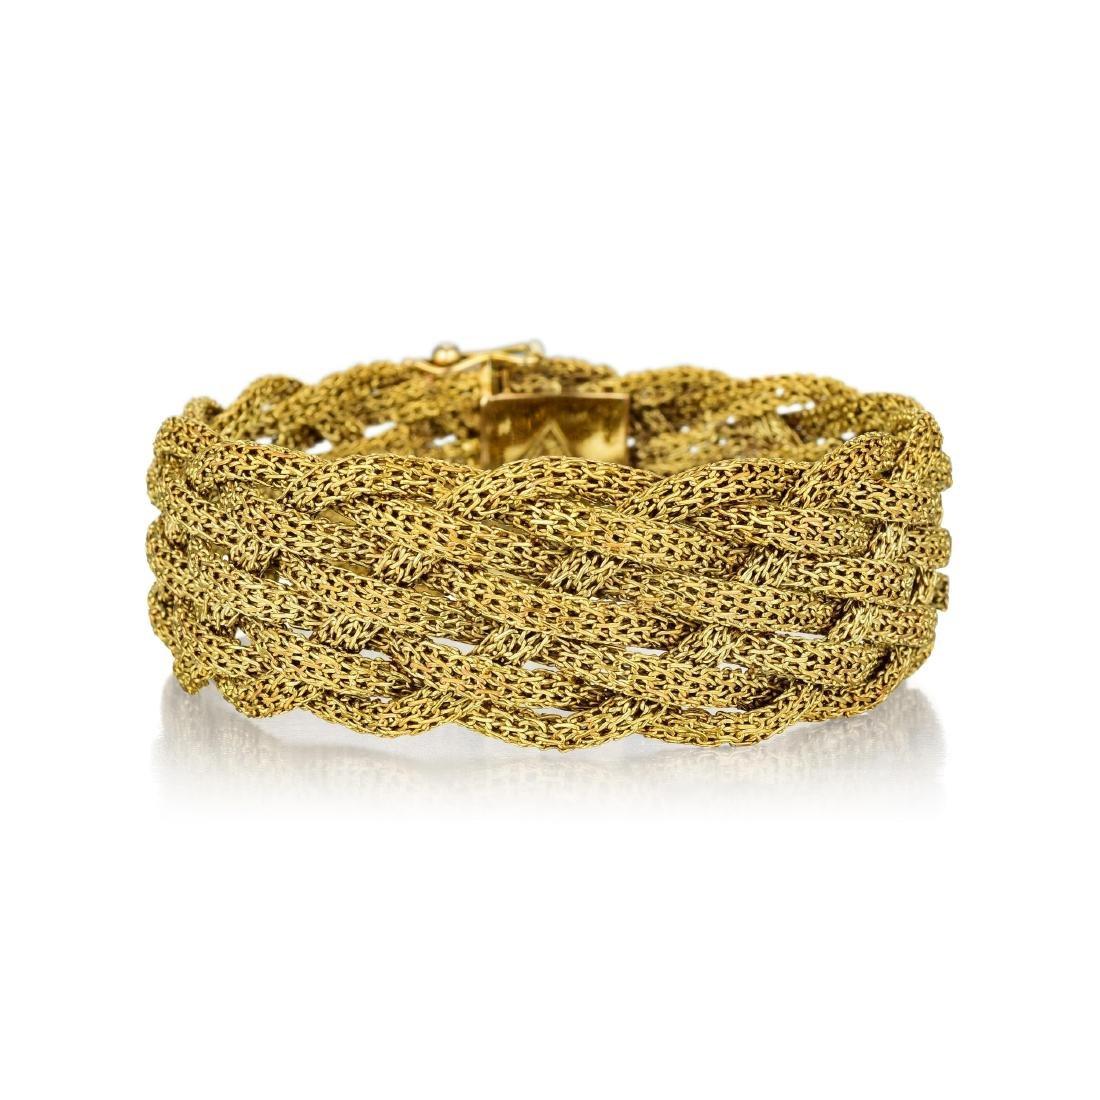 An 18K Gold Braided Bracelet